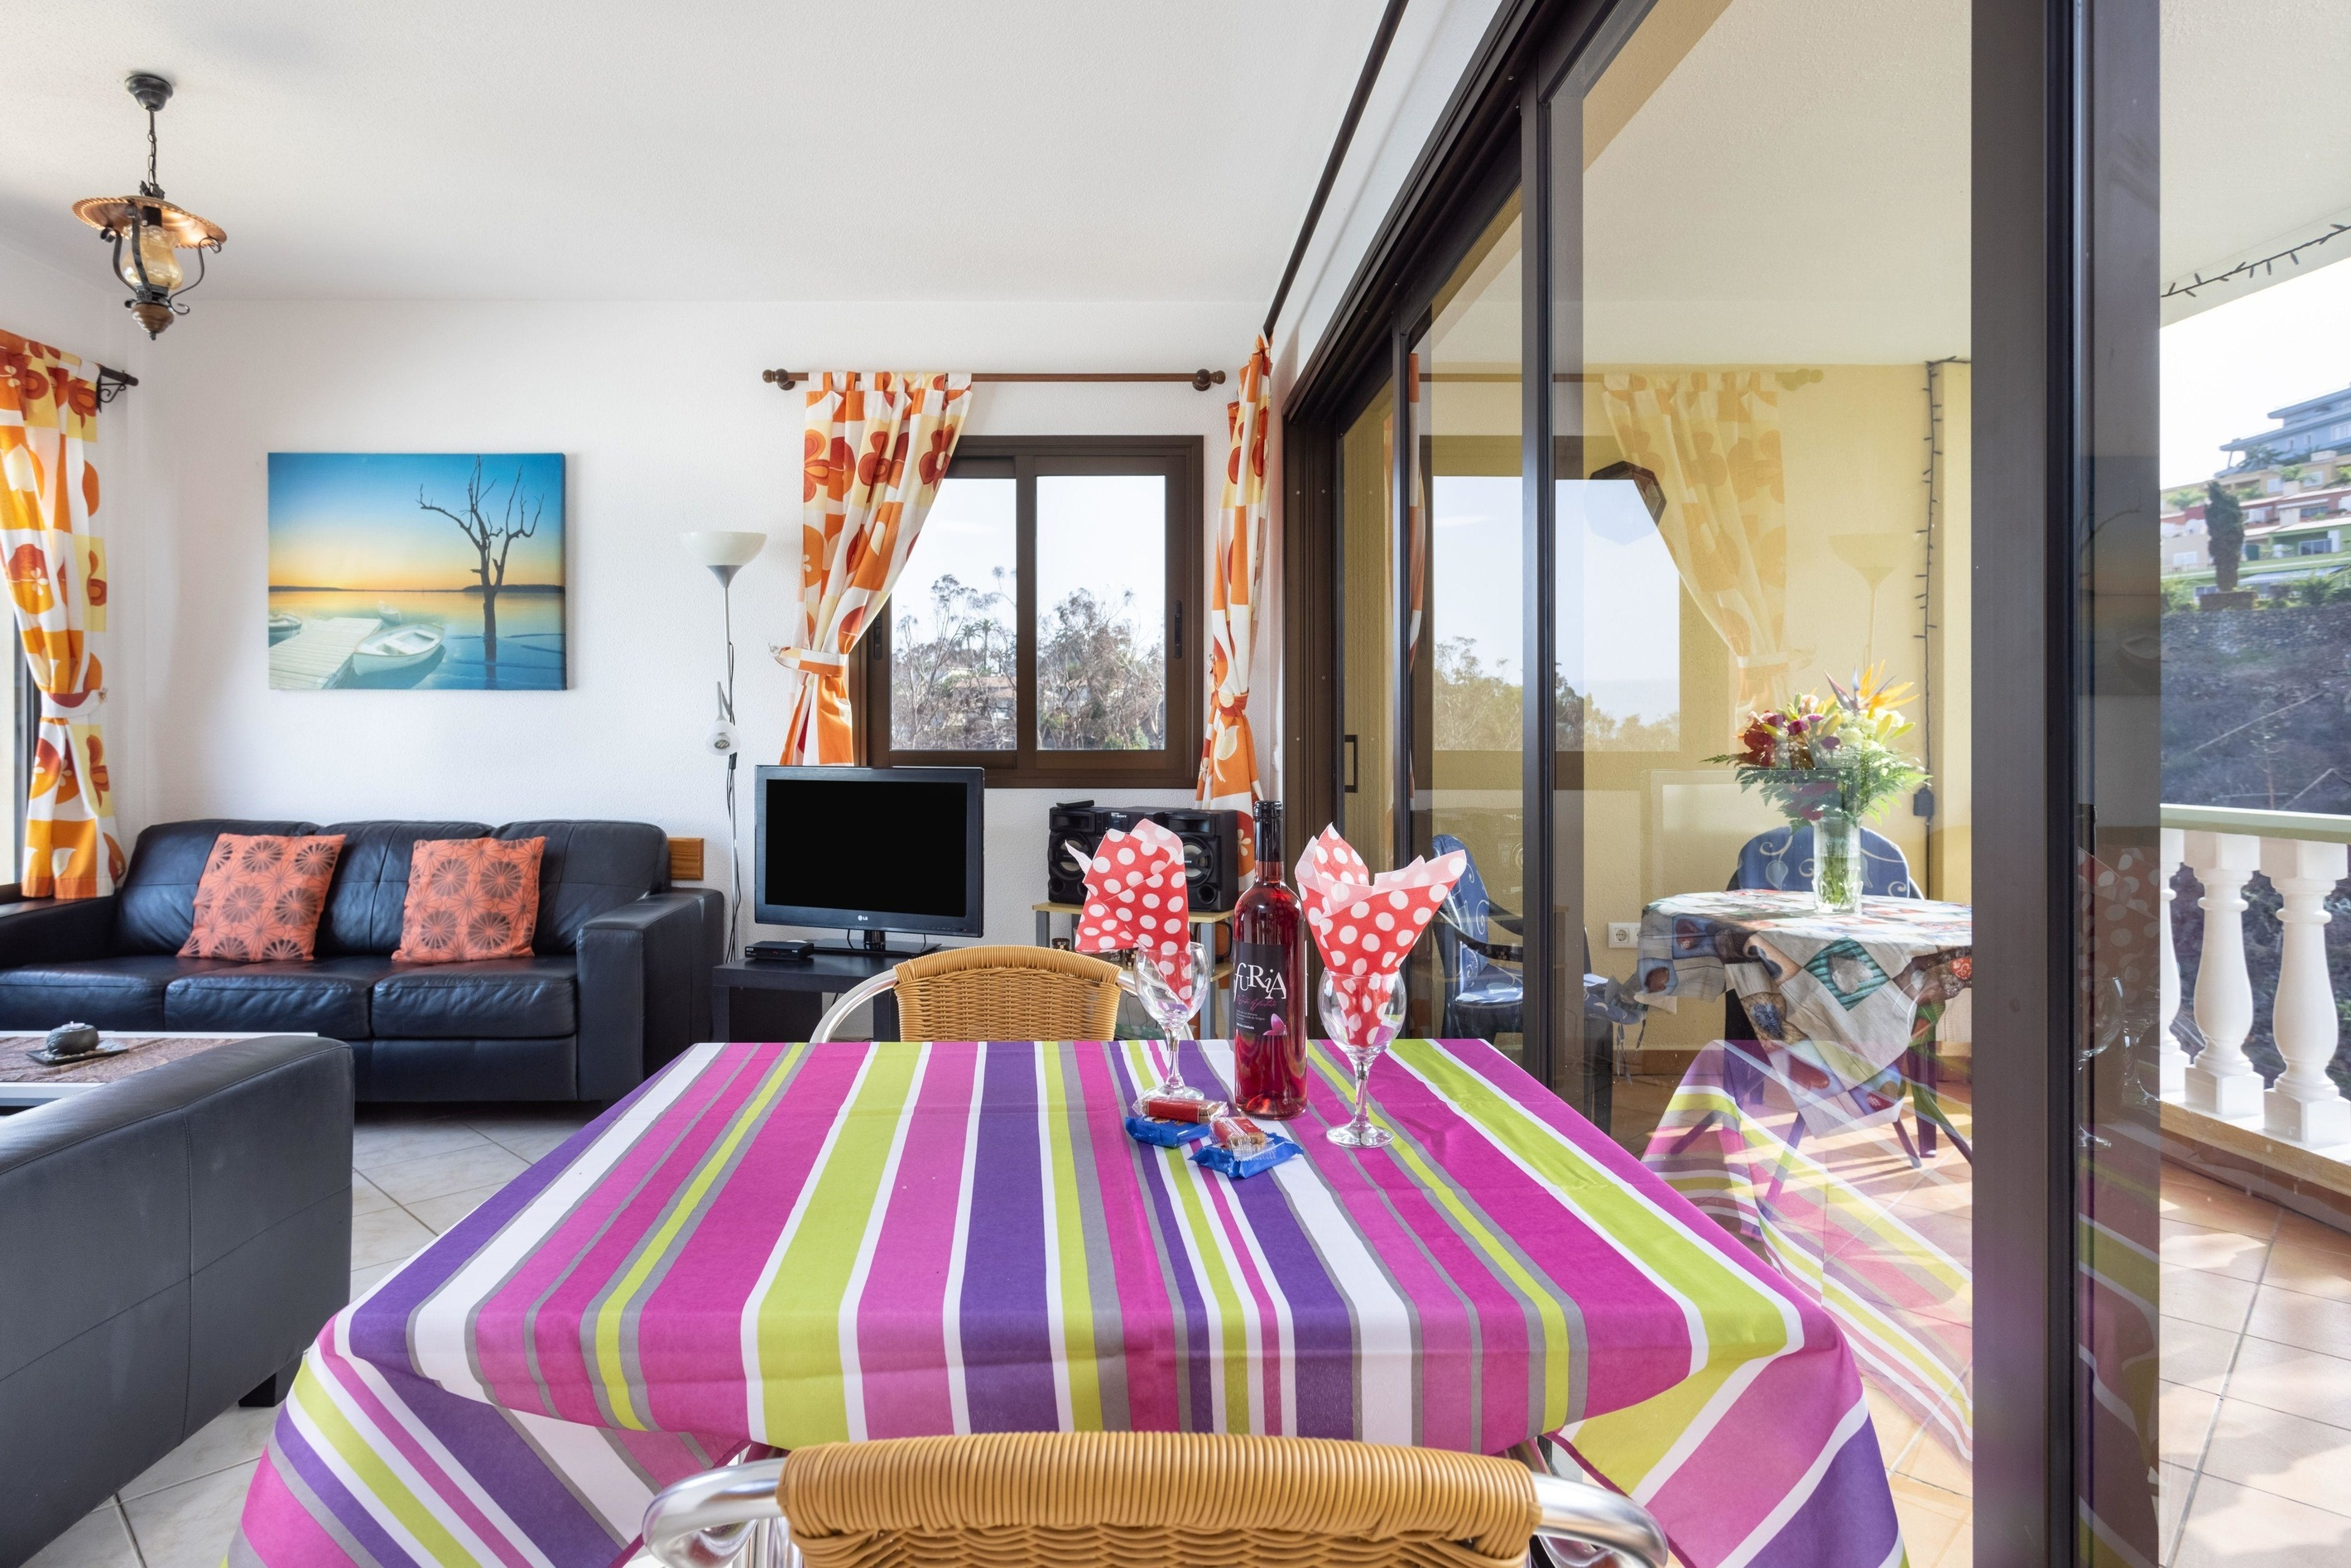 Appartement de vacances Fewo Atico Marazul, mit  Panorama- und Meerblick, Pool, Terrasse, Grill, Parkplatz und WLA (2492979), Santa Ursula, Ténérife, Iles Canaries, Espagne, image 4